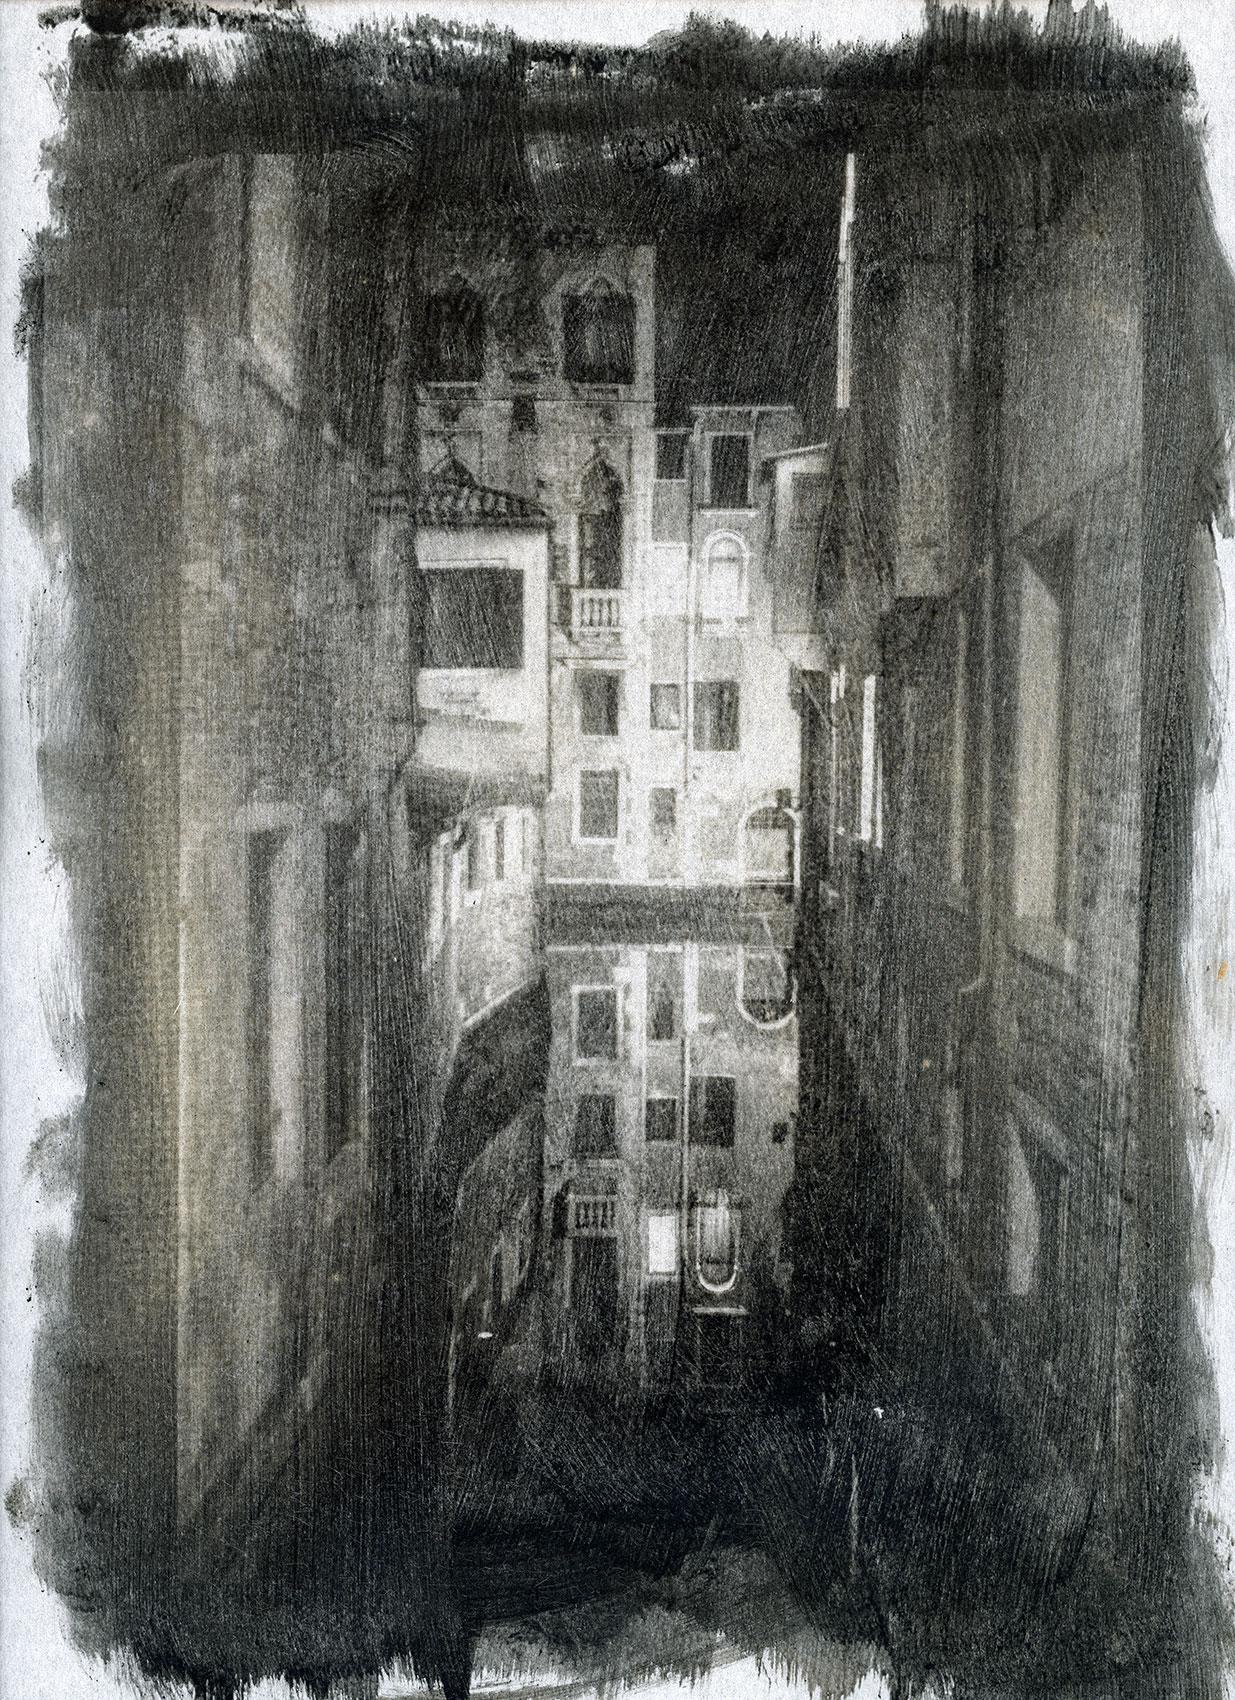 Dark Venice 1 - Night Life | Stefano Paradiso - Photographer